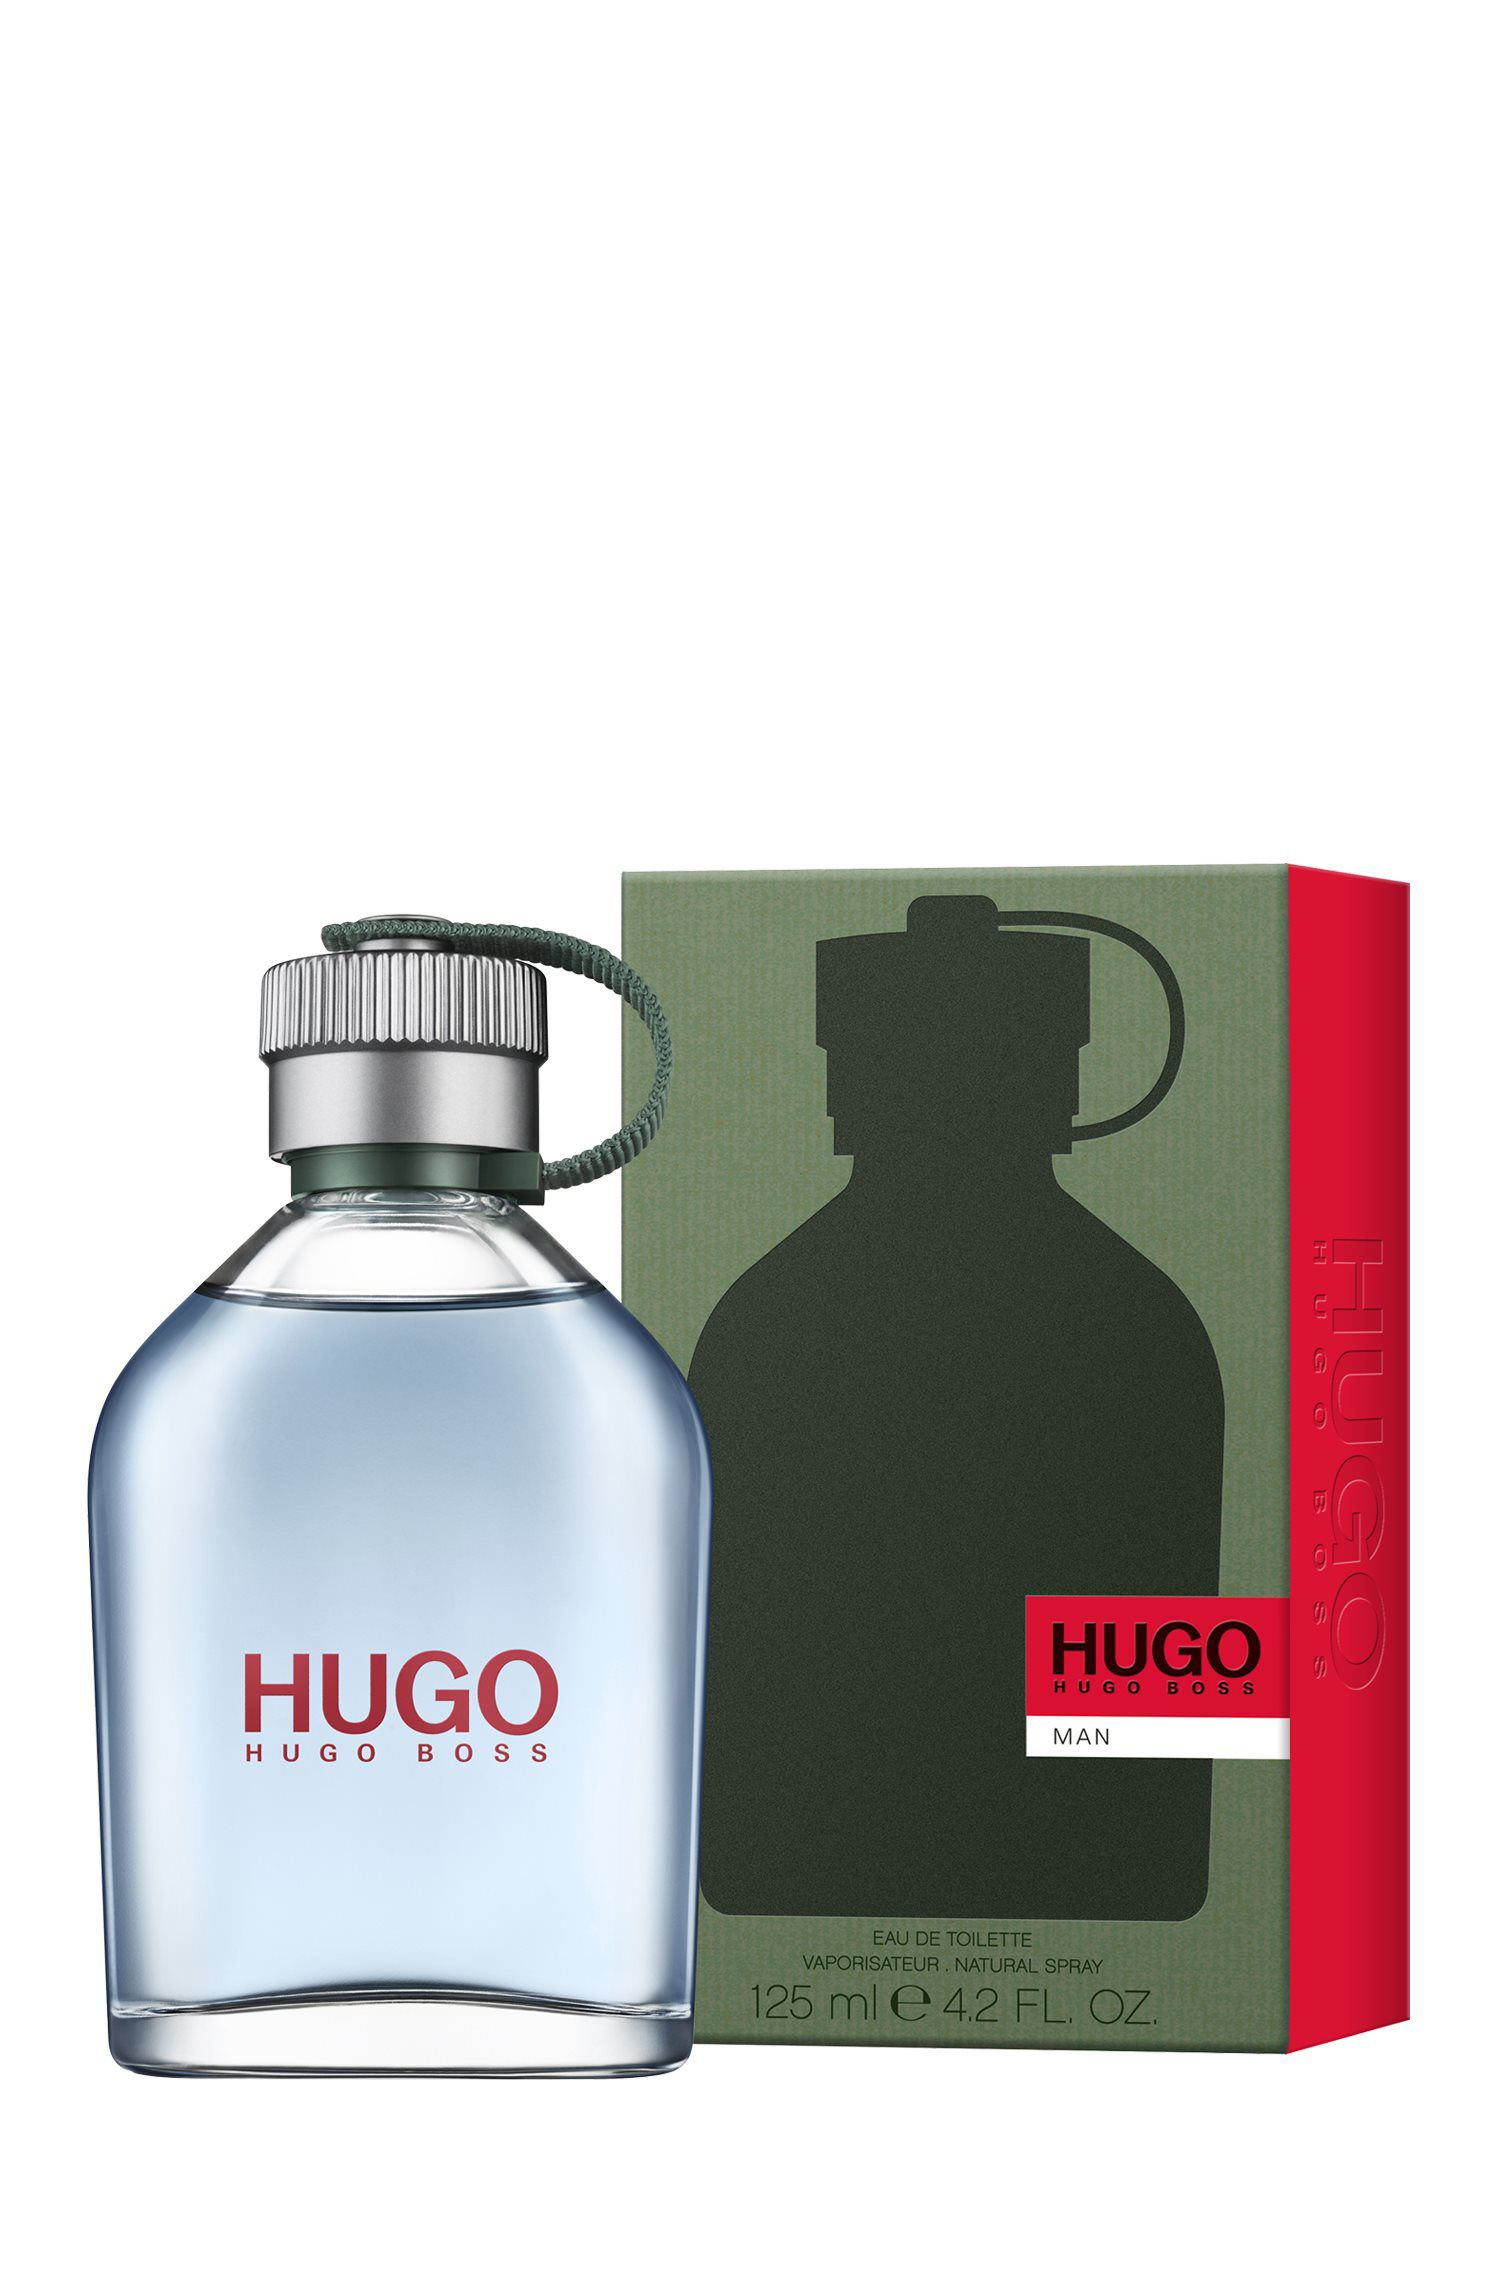 HUGO Man Eau de Toilette 125ml , Assorted-Pre-Pack